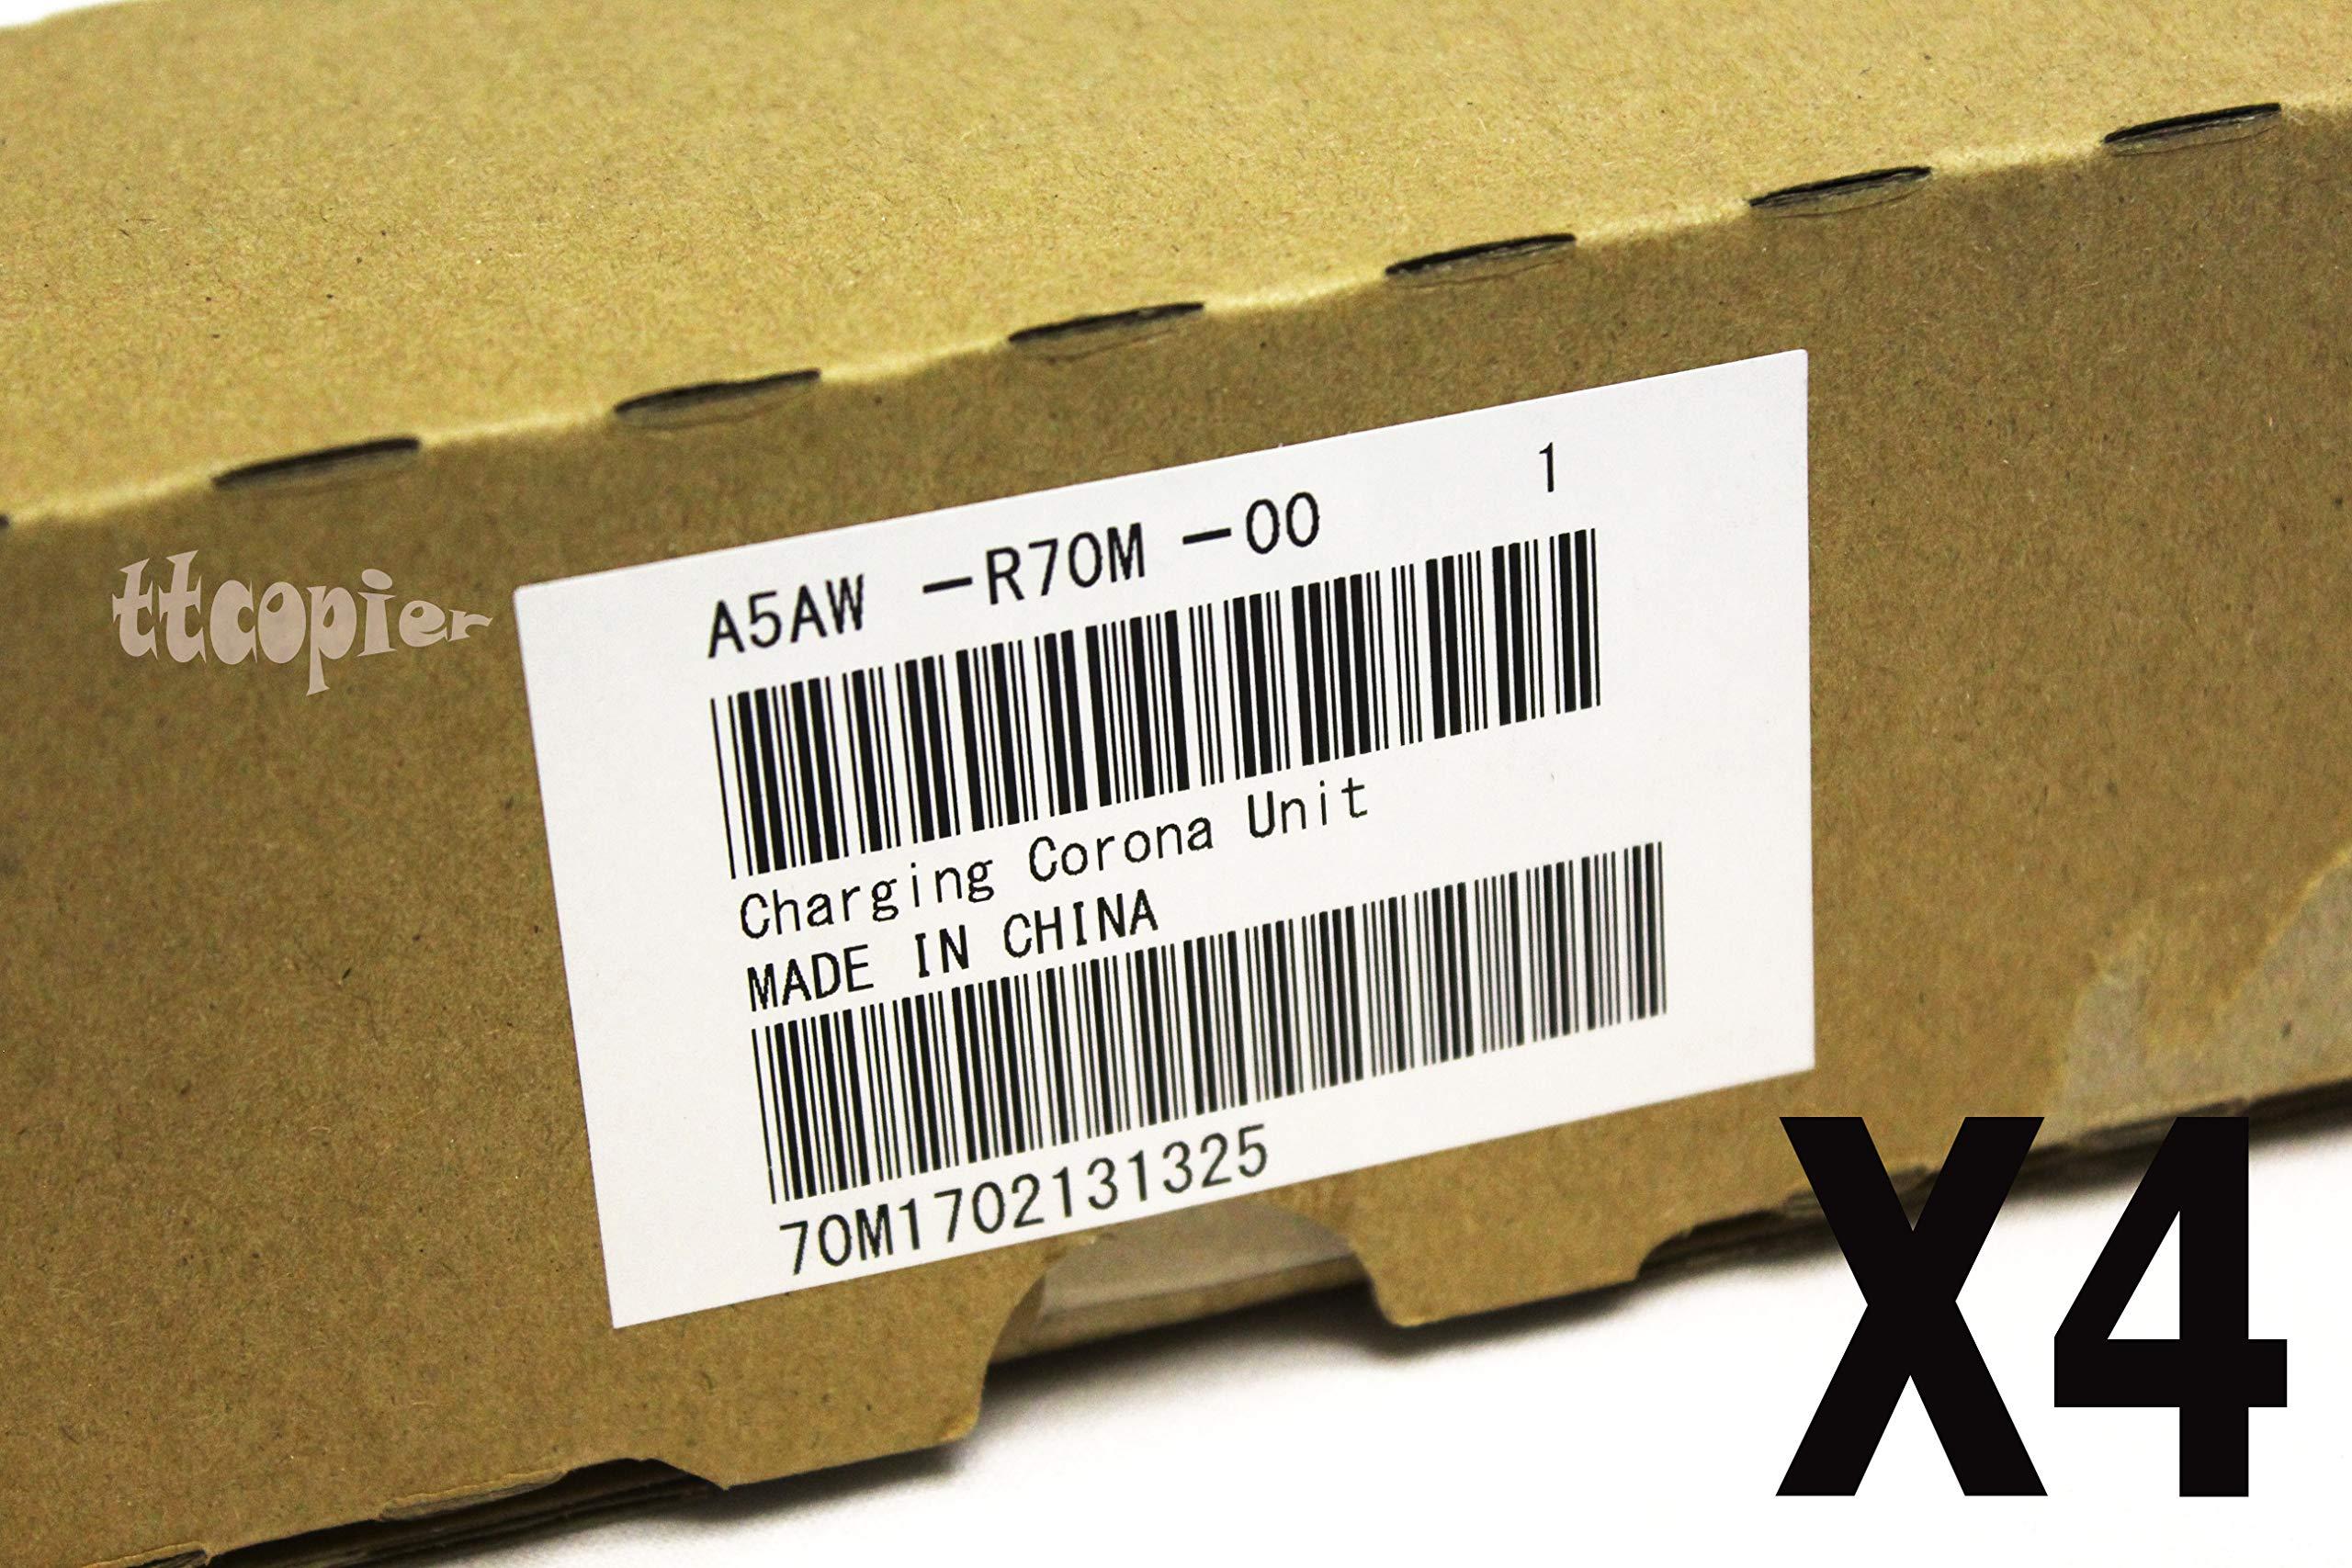 Genuine Konica Minolta Lot of 4, A5AWR70M00 Charging Corona Unit for C1100 C1085